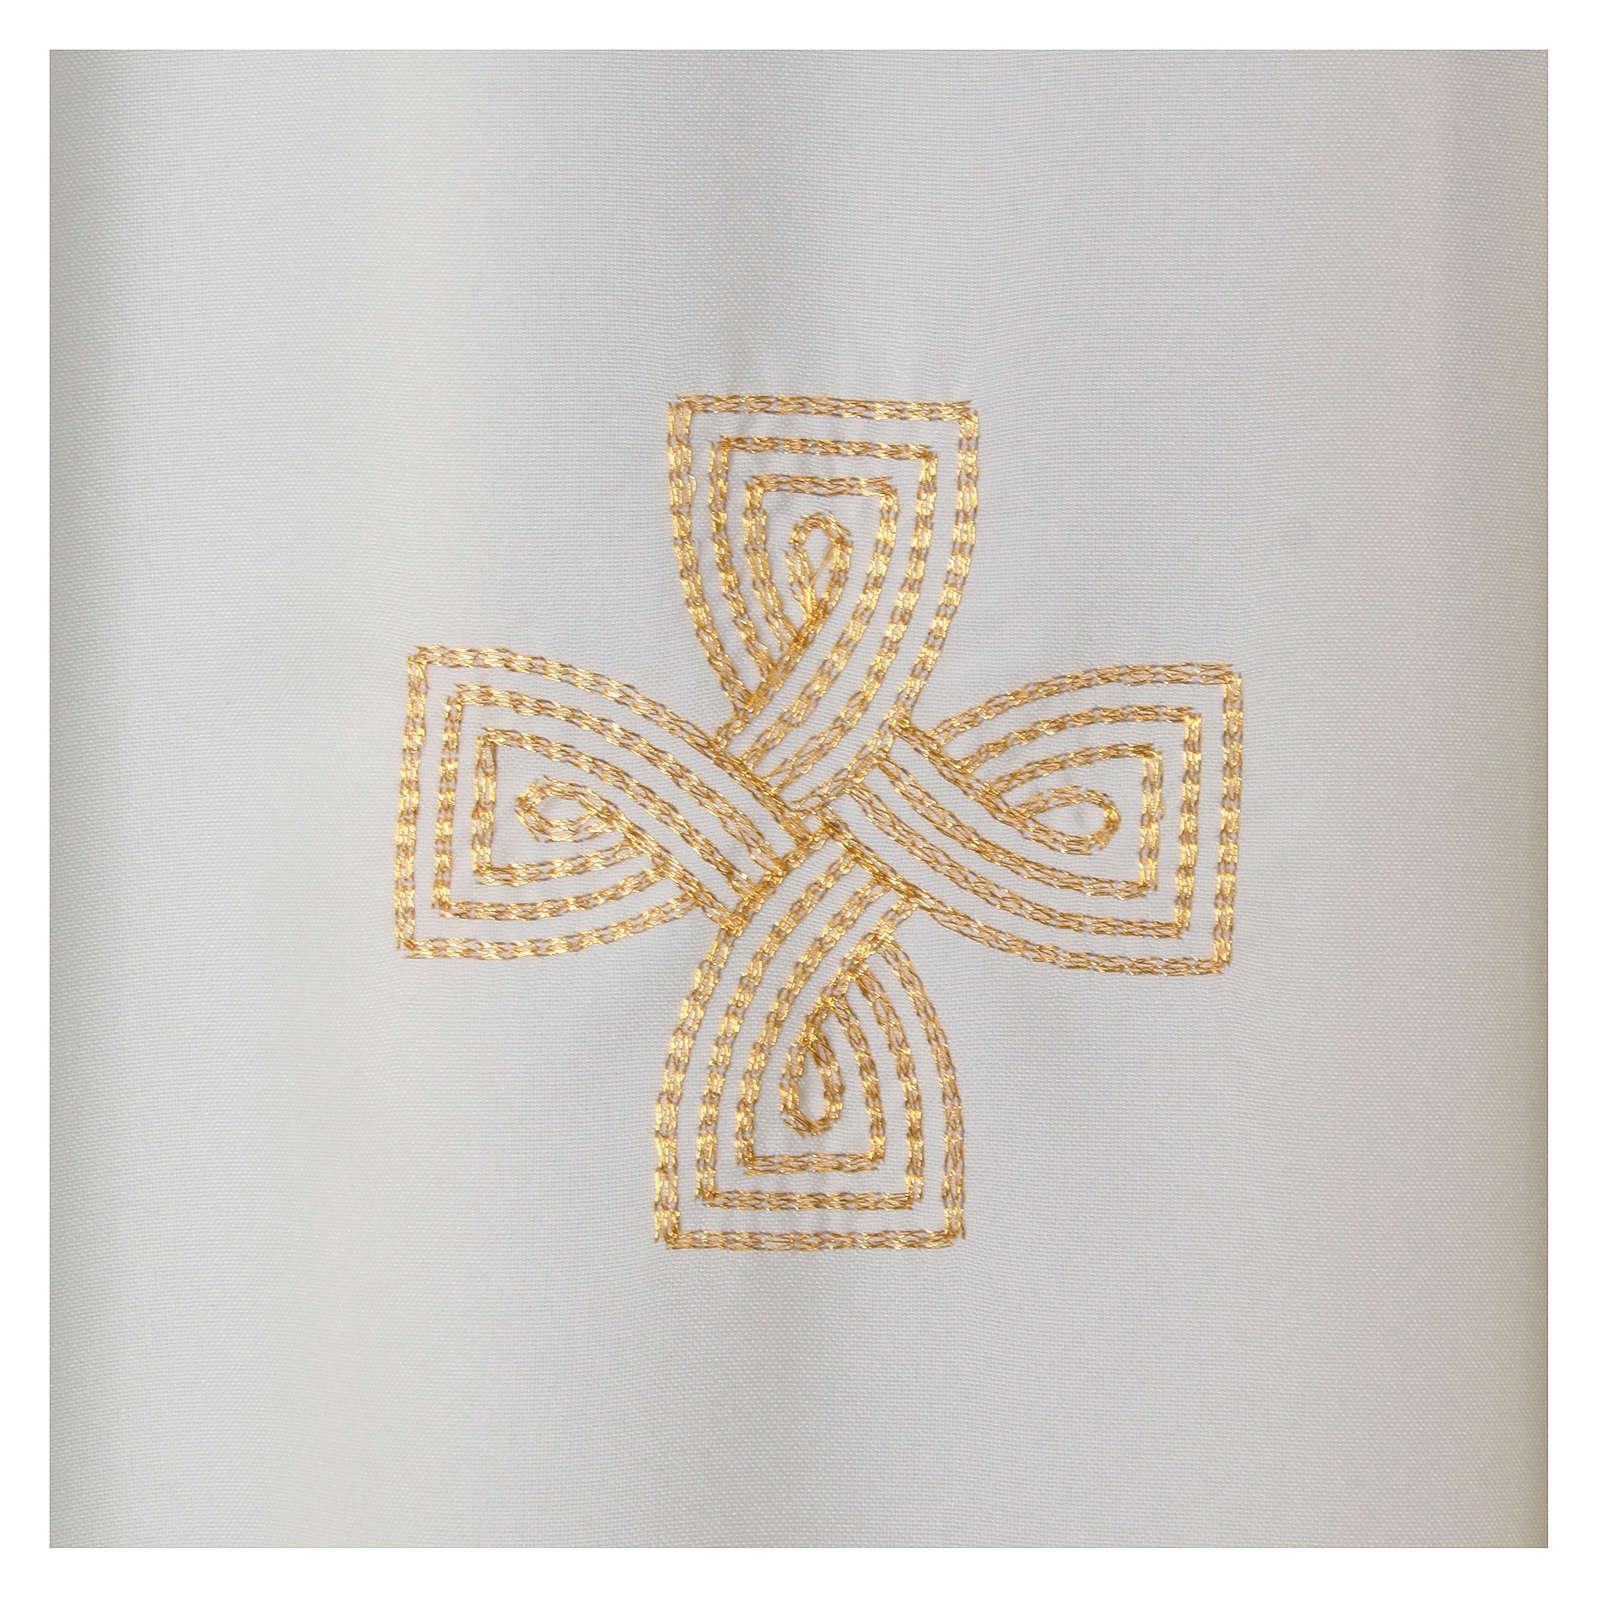 Casula 3 cruzes bordado entrelaçado 4